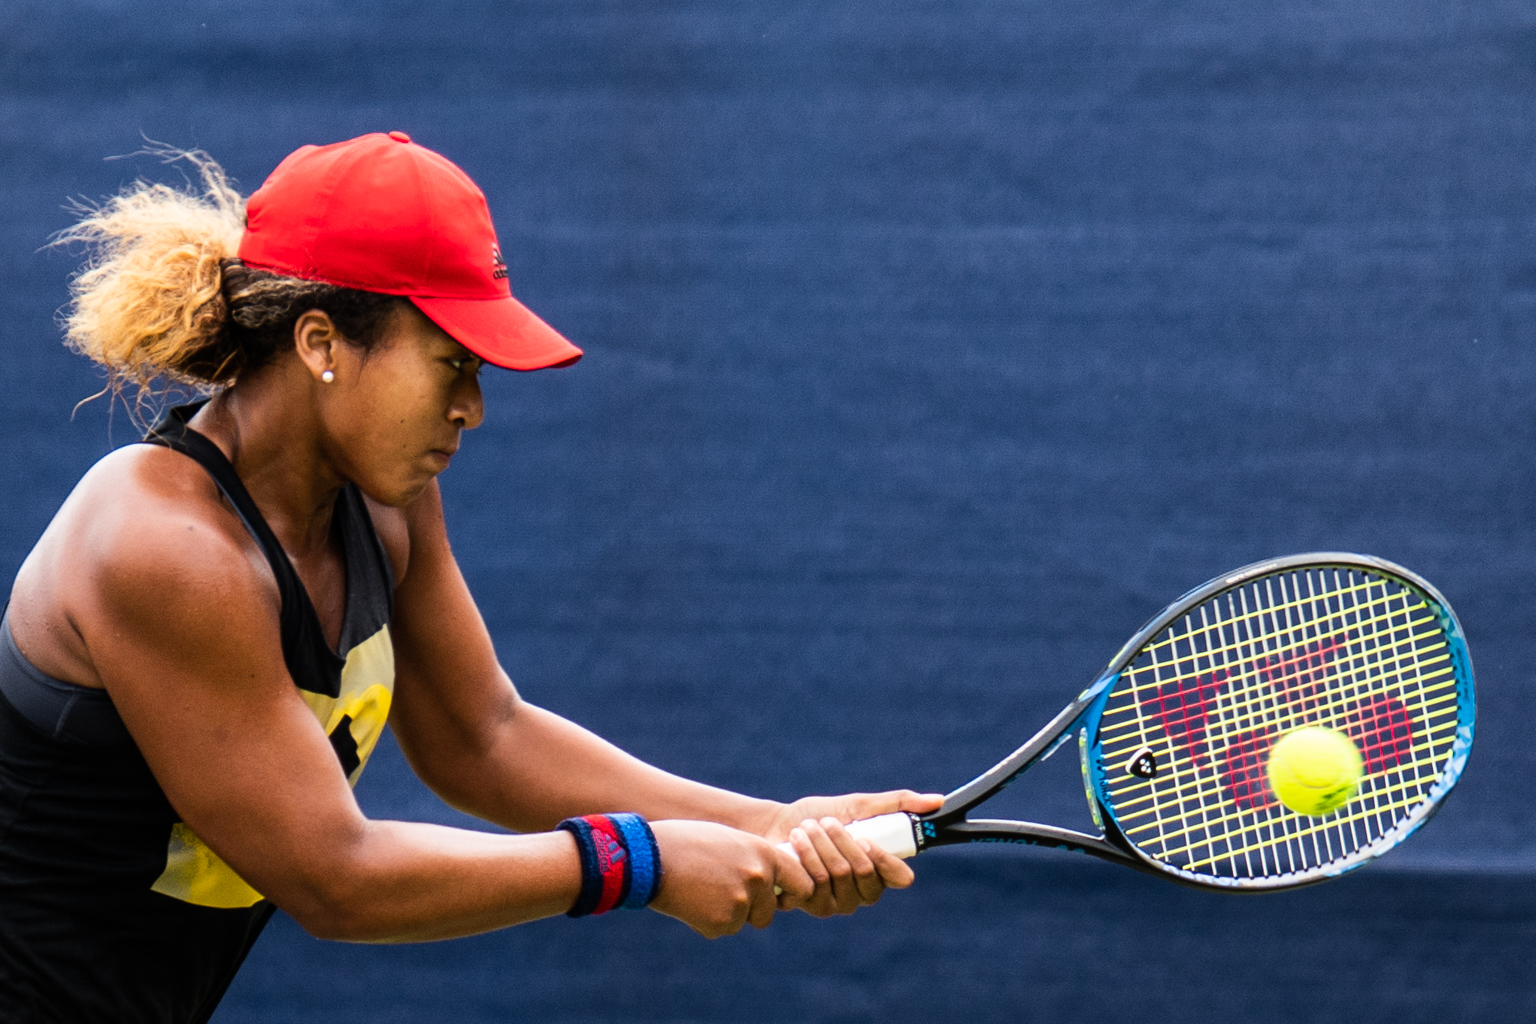 Naomi Osaka: Meet Naomi Osaka, 2018 US Open Champion And Japan's First